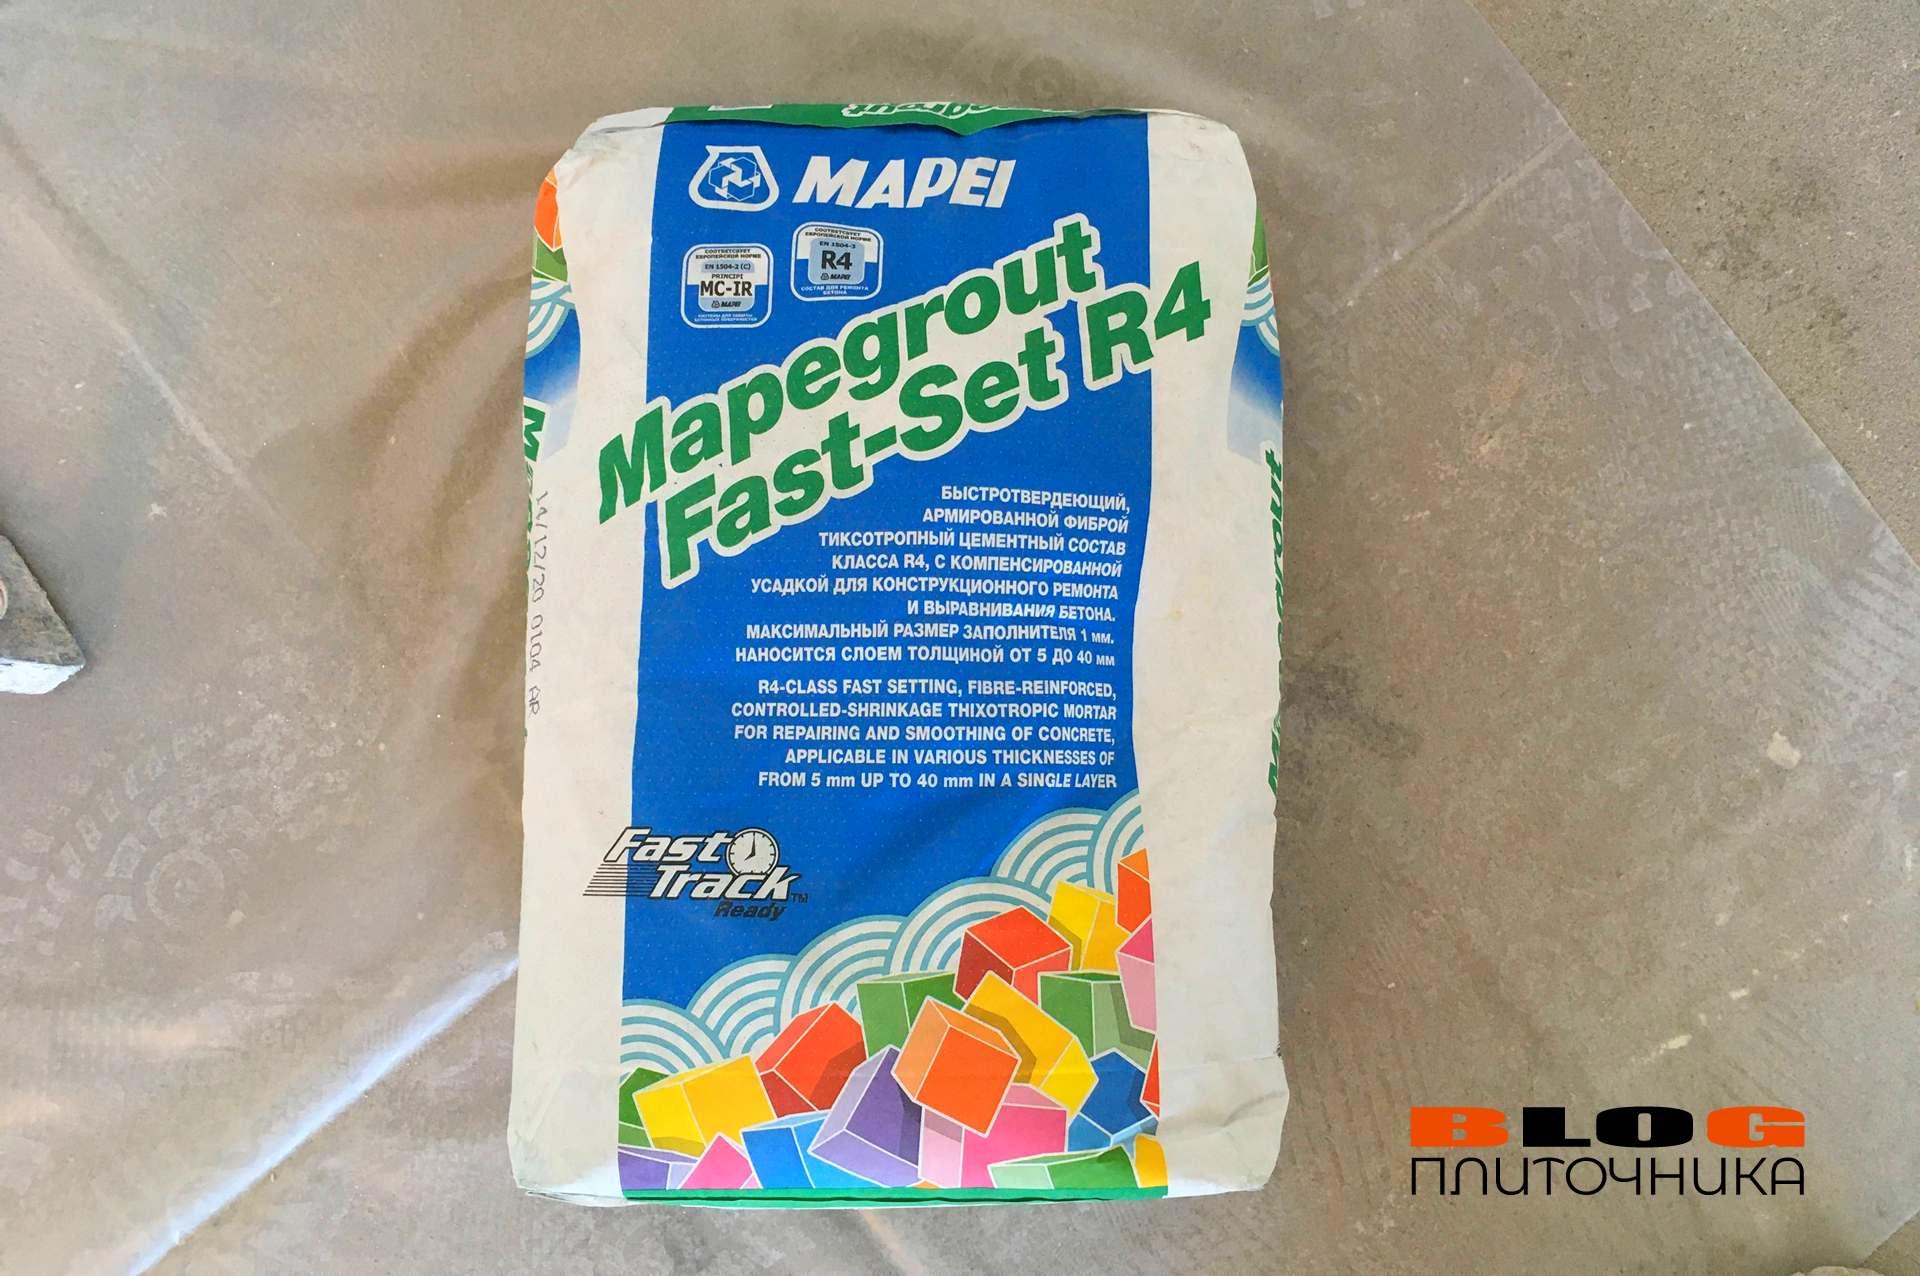 3. штукатурная смесь mapei mapegrout fast set r4